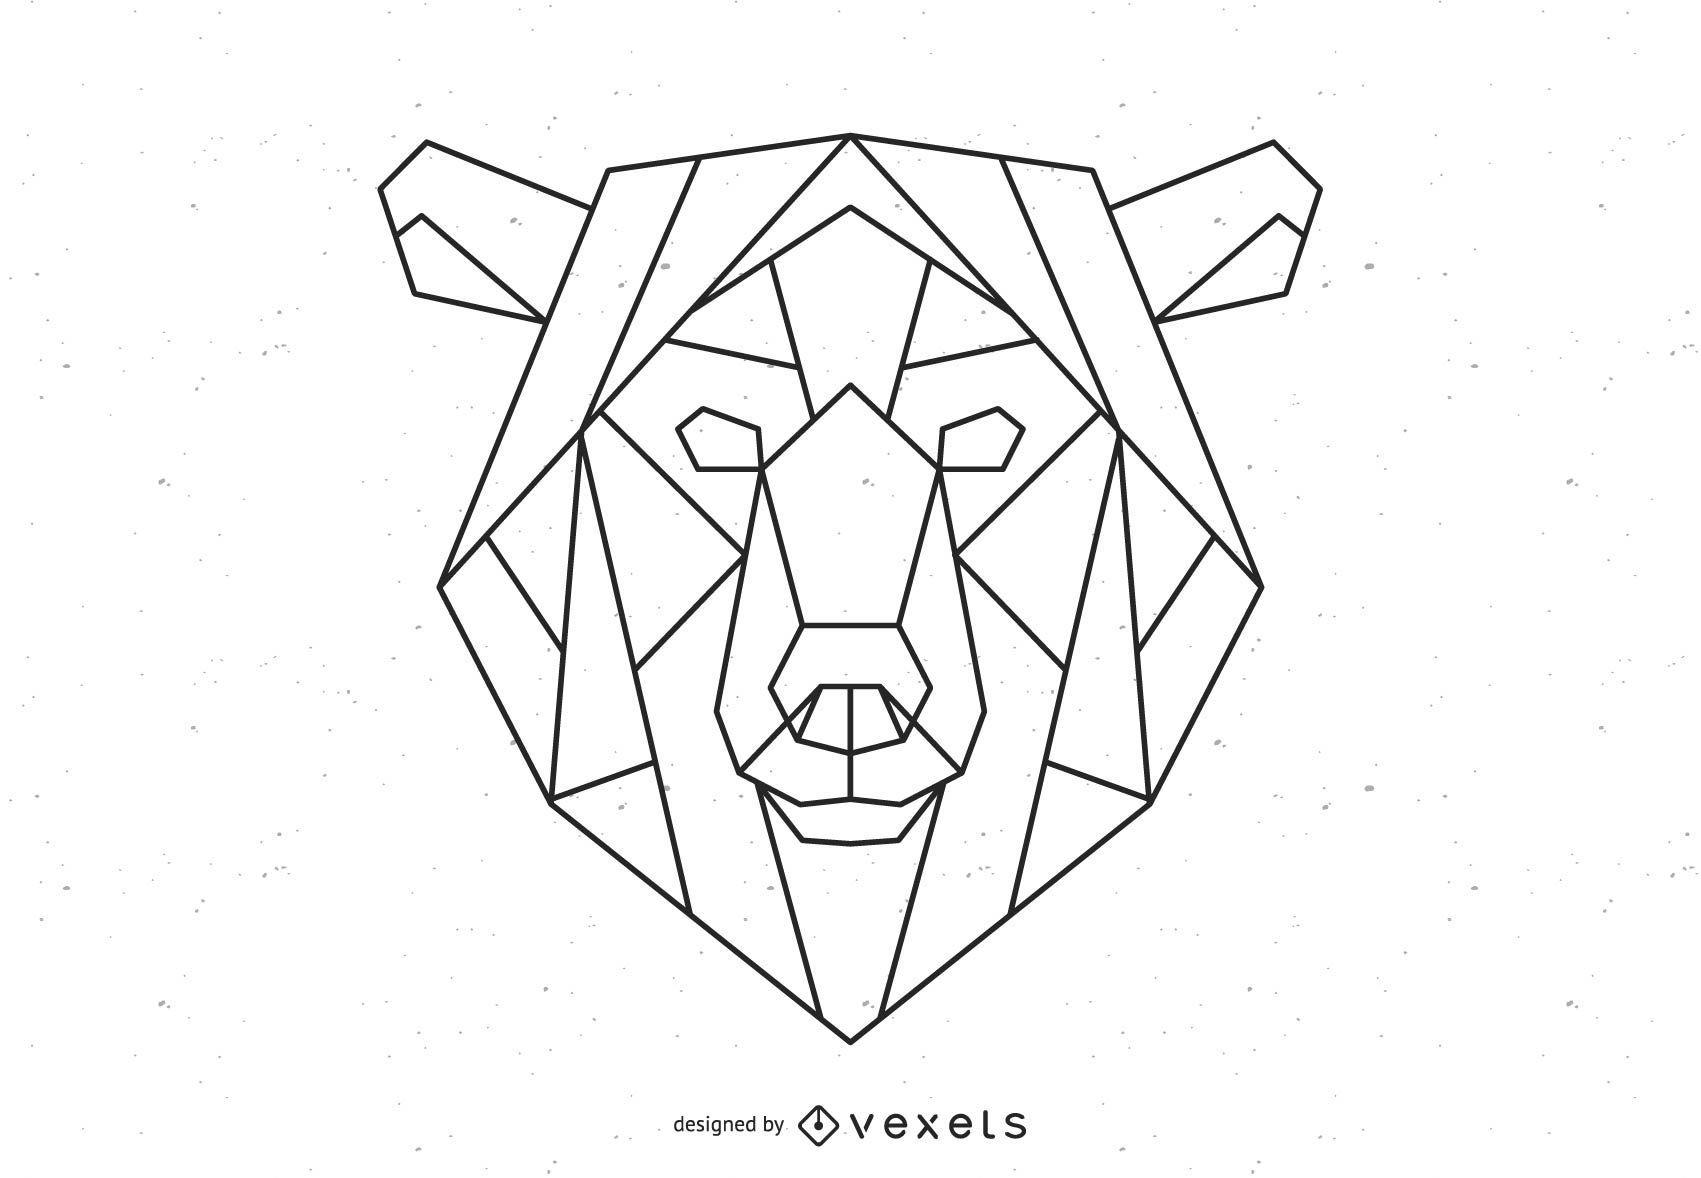 Ilustración de trazo de oso poligonal